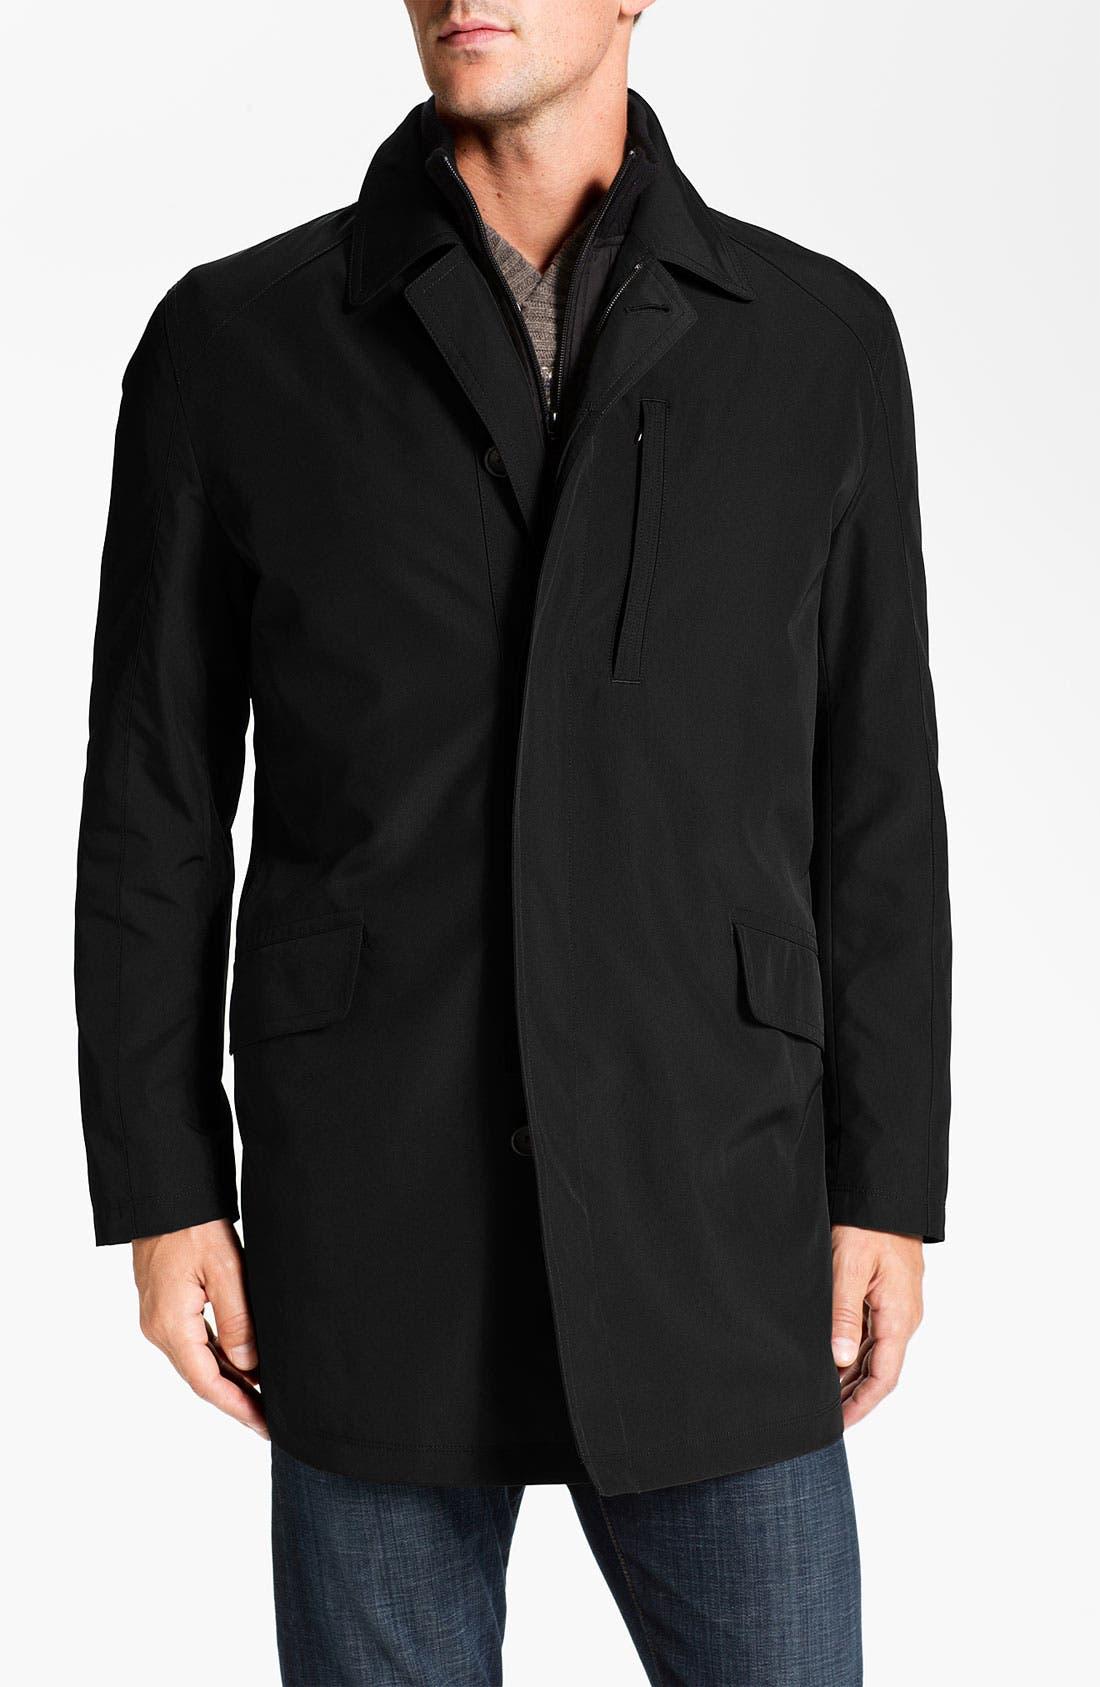 Alternate Image 1 Selected - Sanyo 3-in-1 Jacket